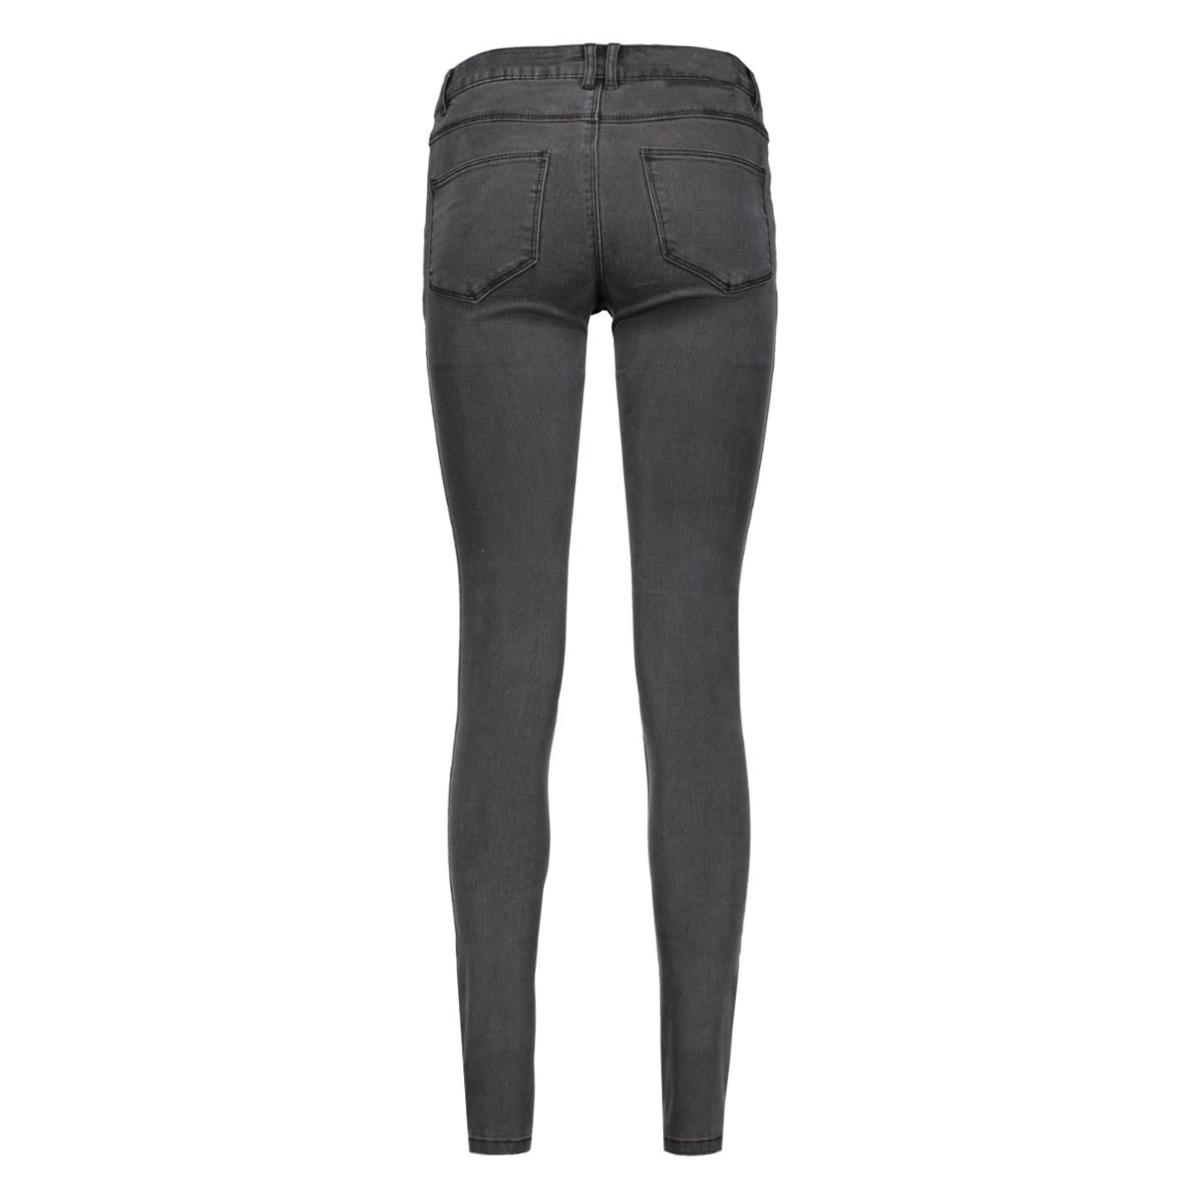 vicommit lux rw 5p washed grey-noos 14036433 vila jeans grey denim